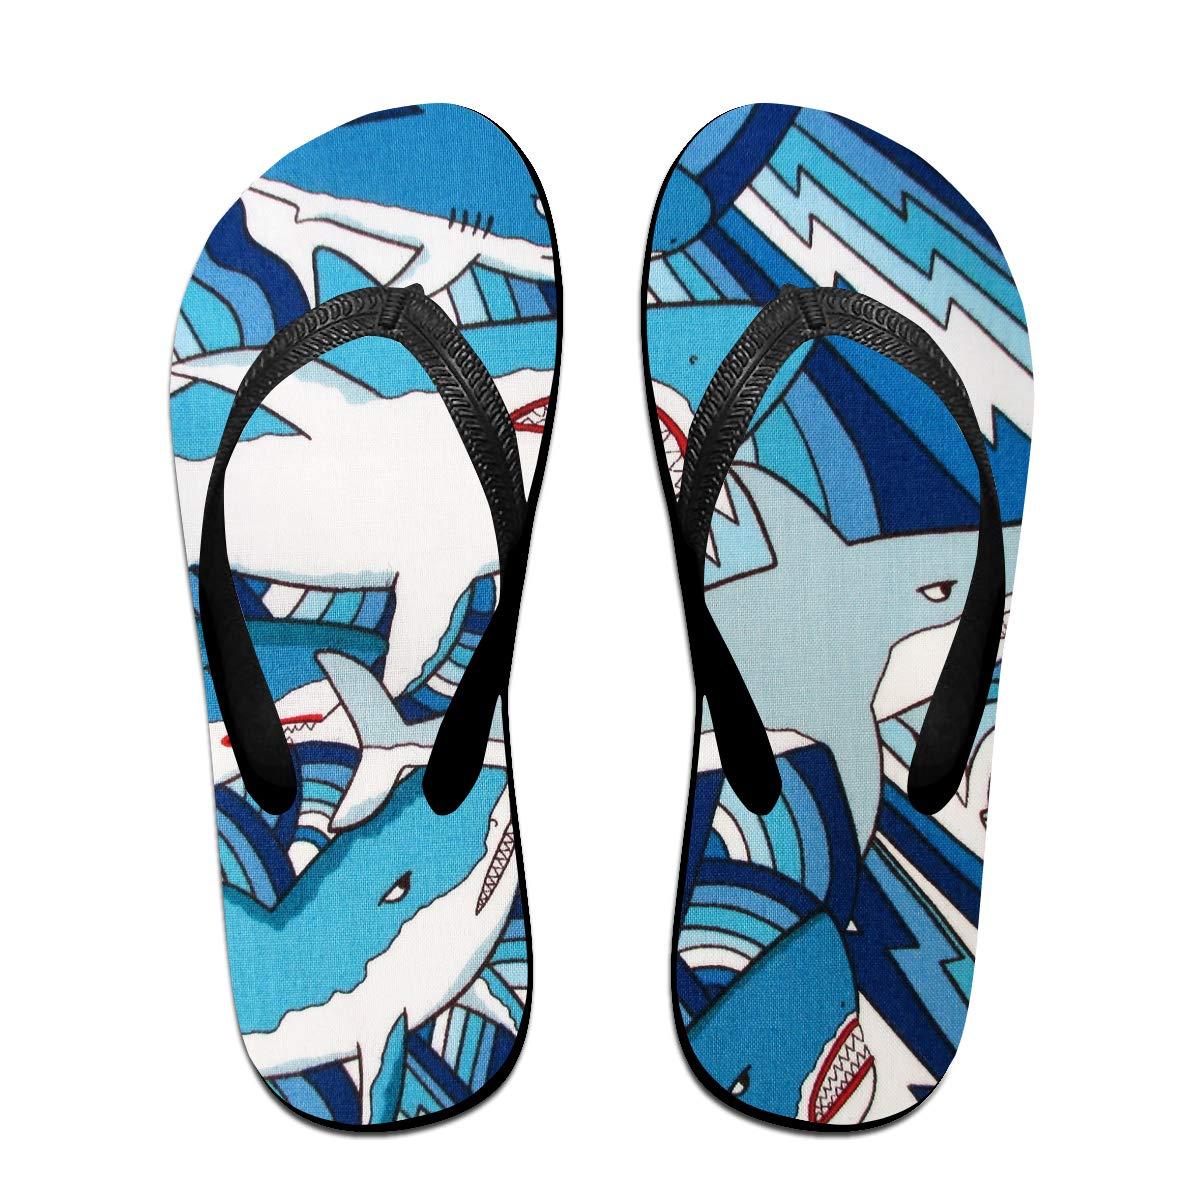 Couple Slipper Shark Playing Print Flip Flops Unisex Chic Sandals Rubber Non-Slip Beach Thong Slippers